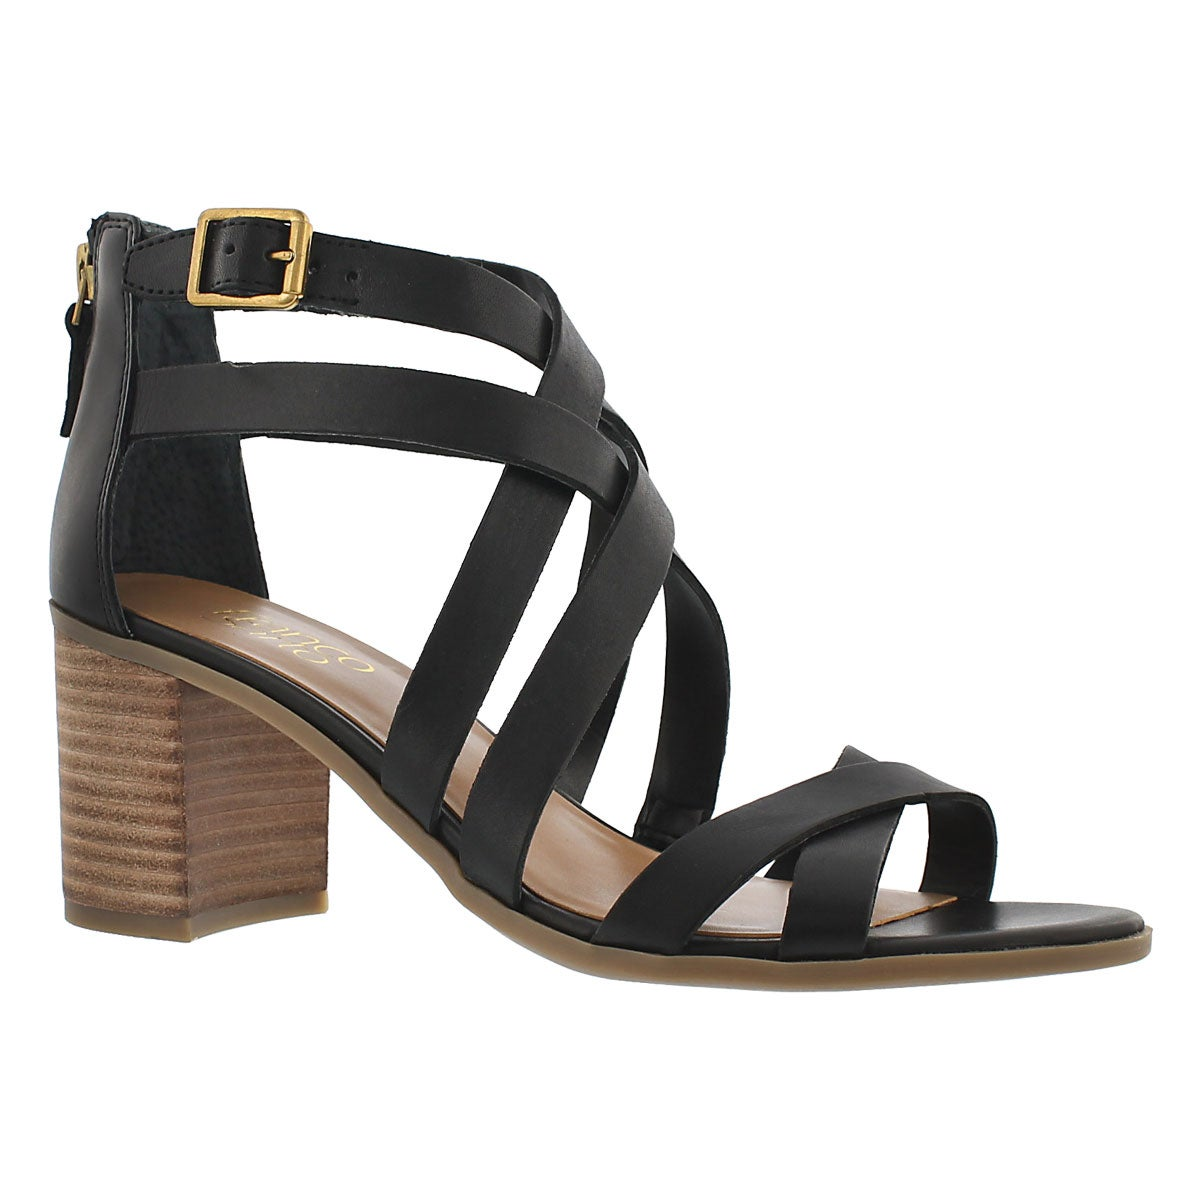 Lds Hachi blk cross strap dress sandal